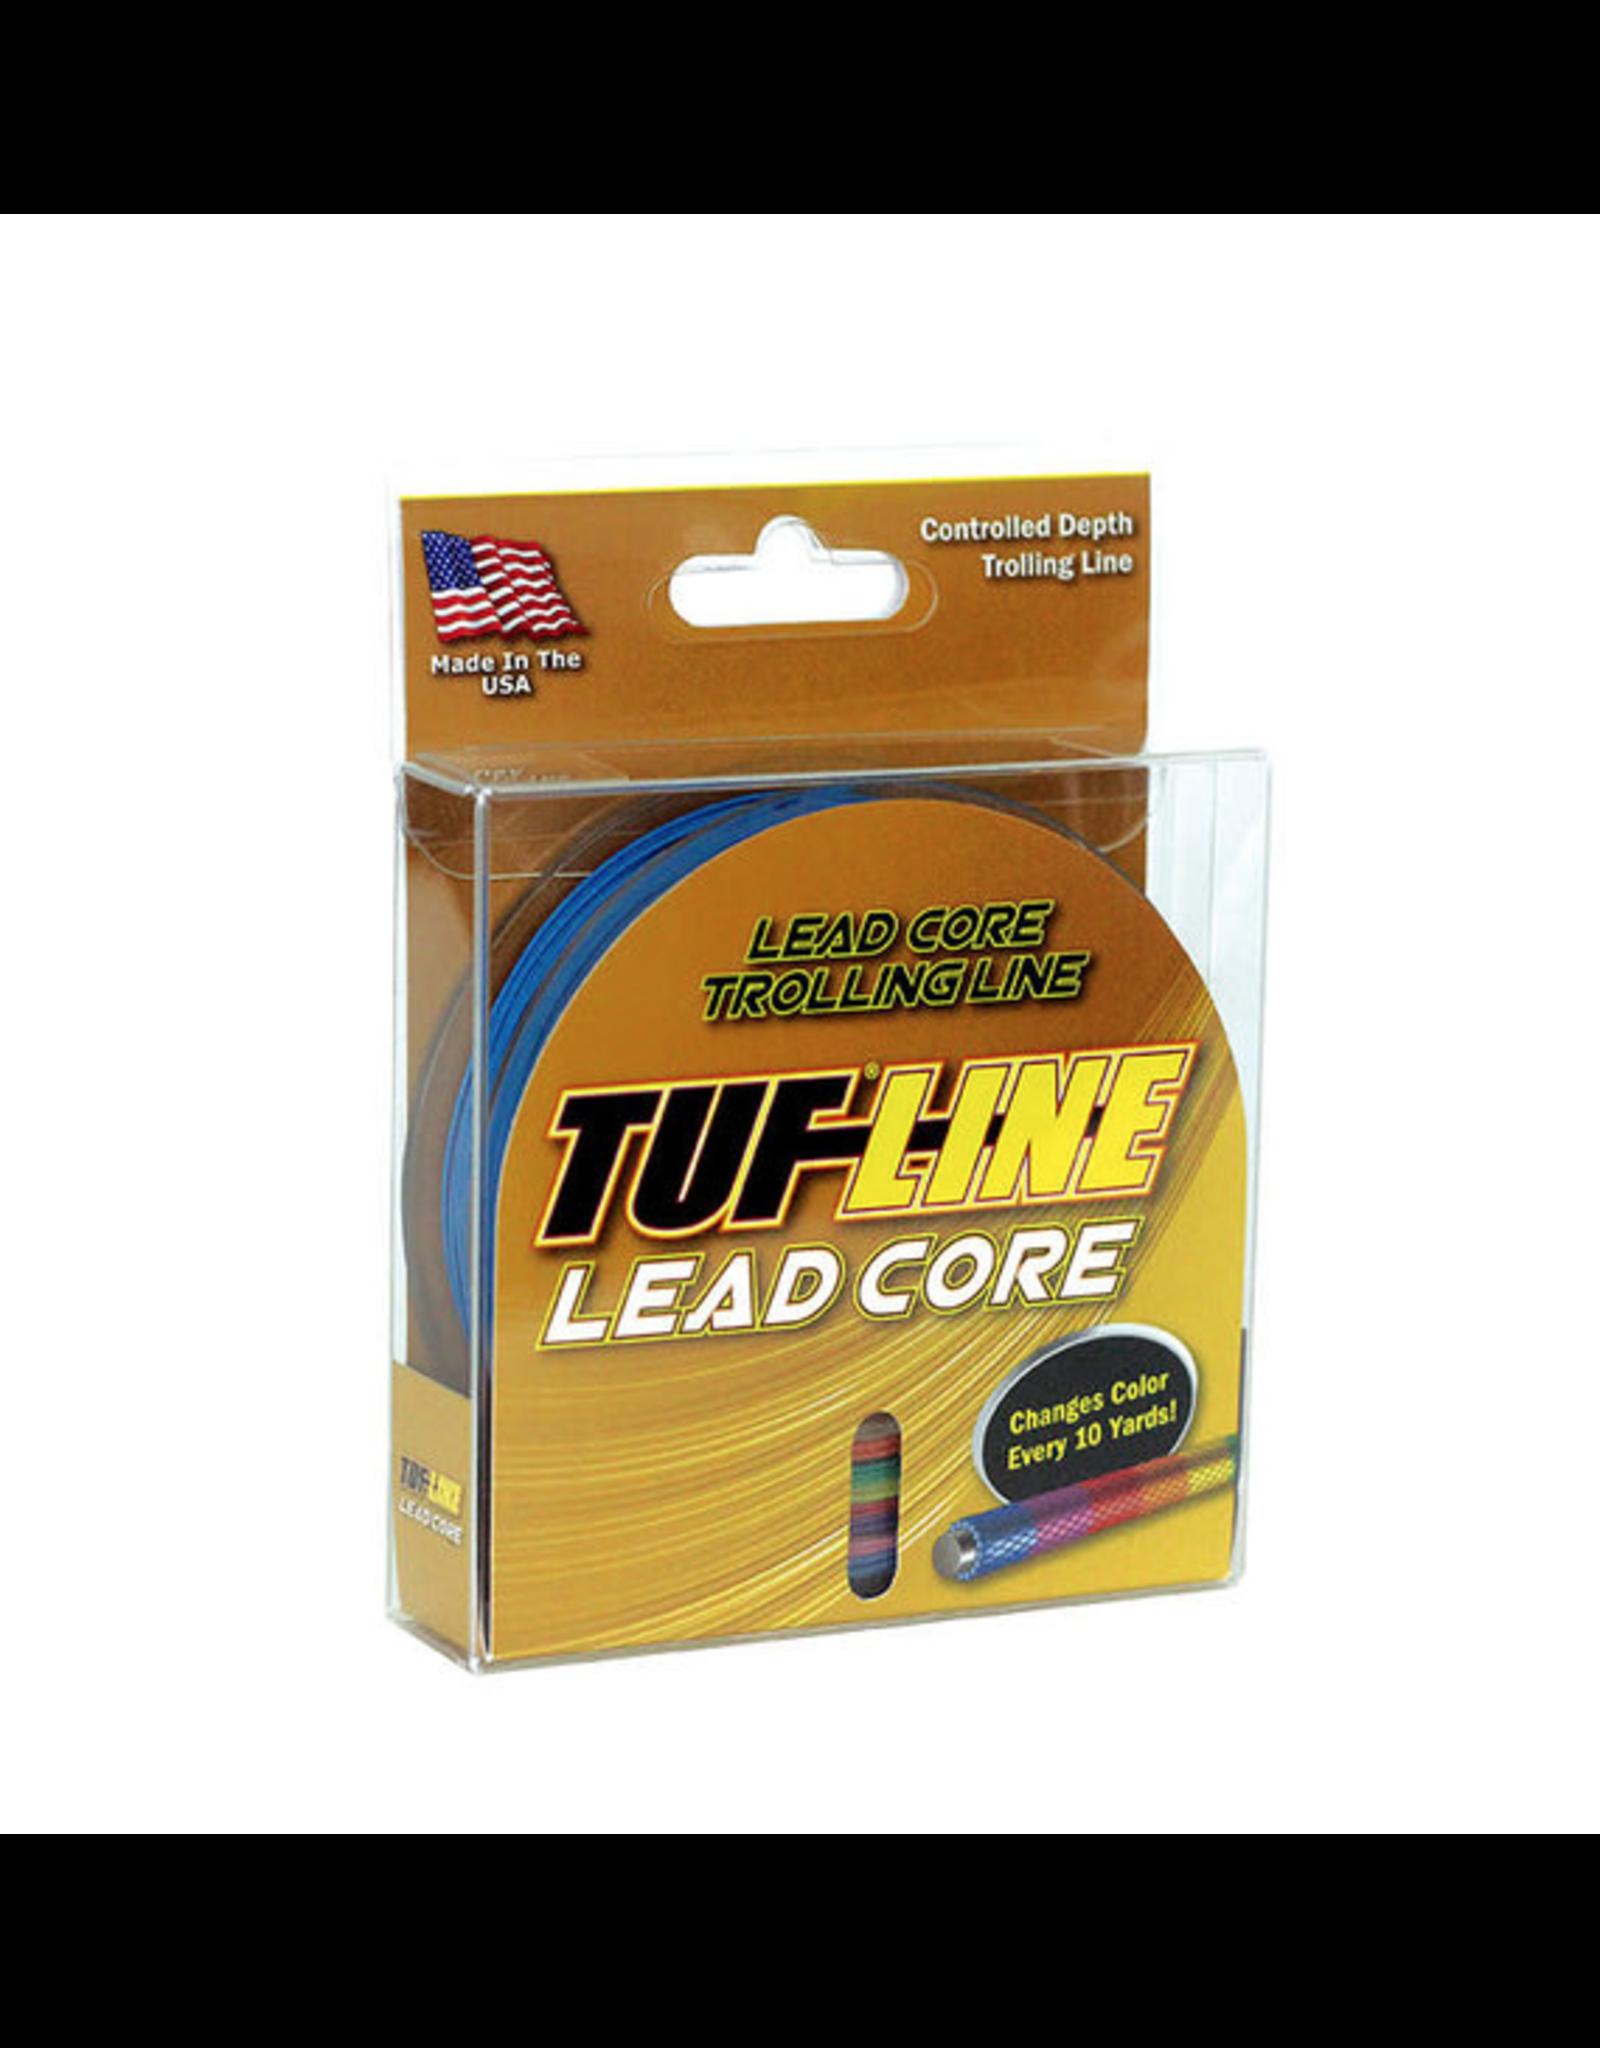 Tuf-Line Tuf-Line LC18100 Lead Core Trolling